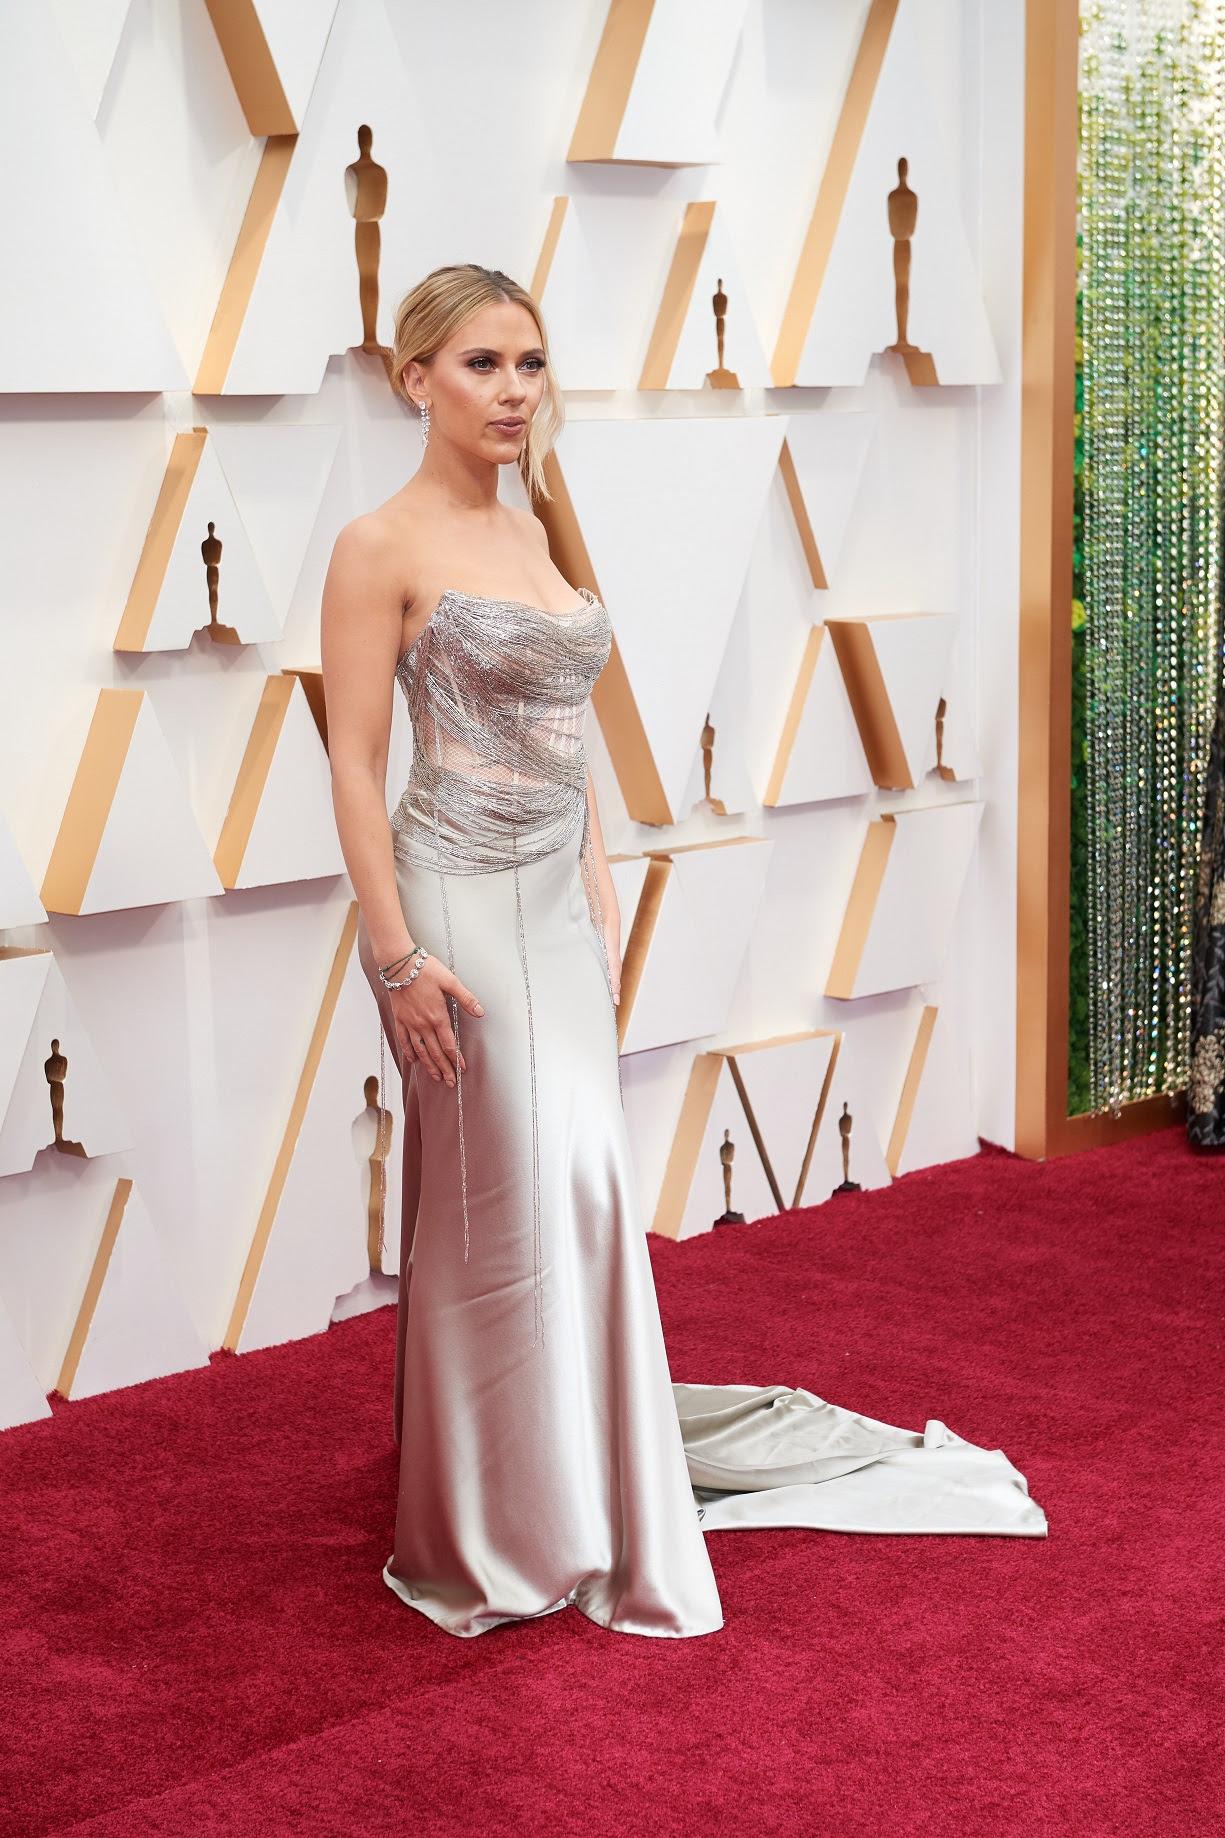 Oscars 2020: Best Dressed Stars - Fashion Experts